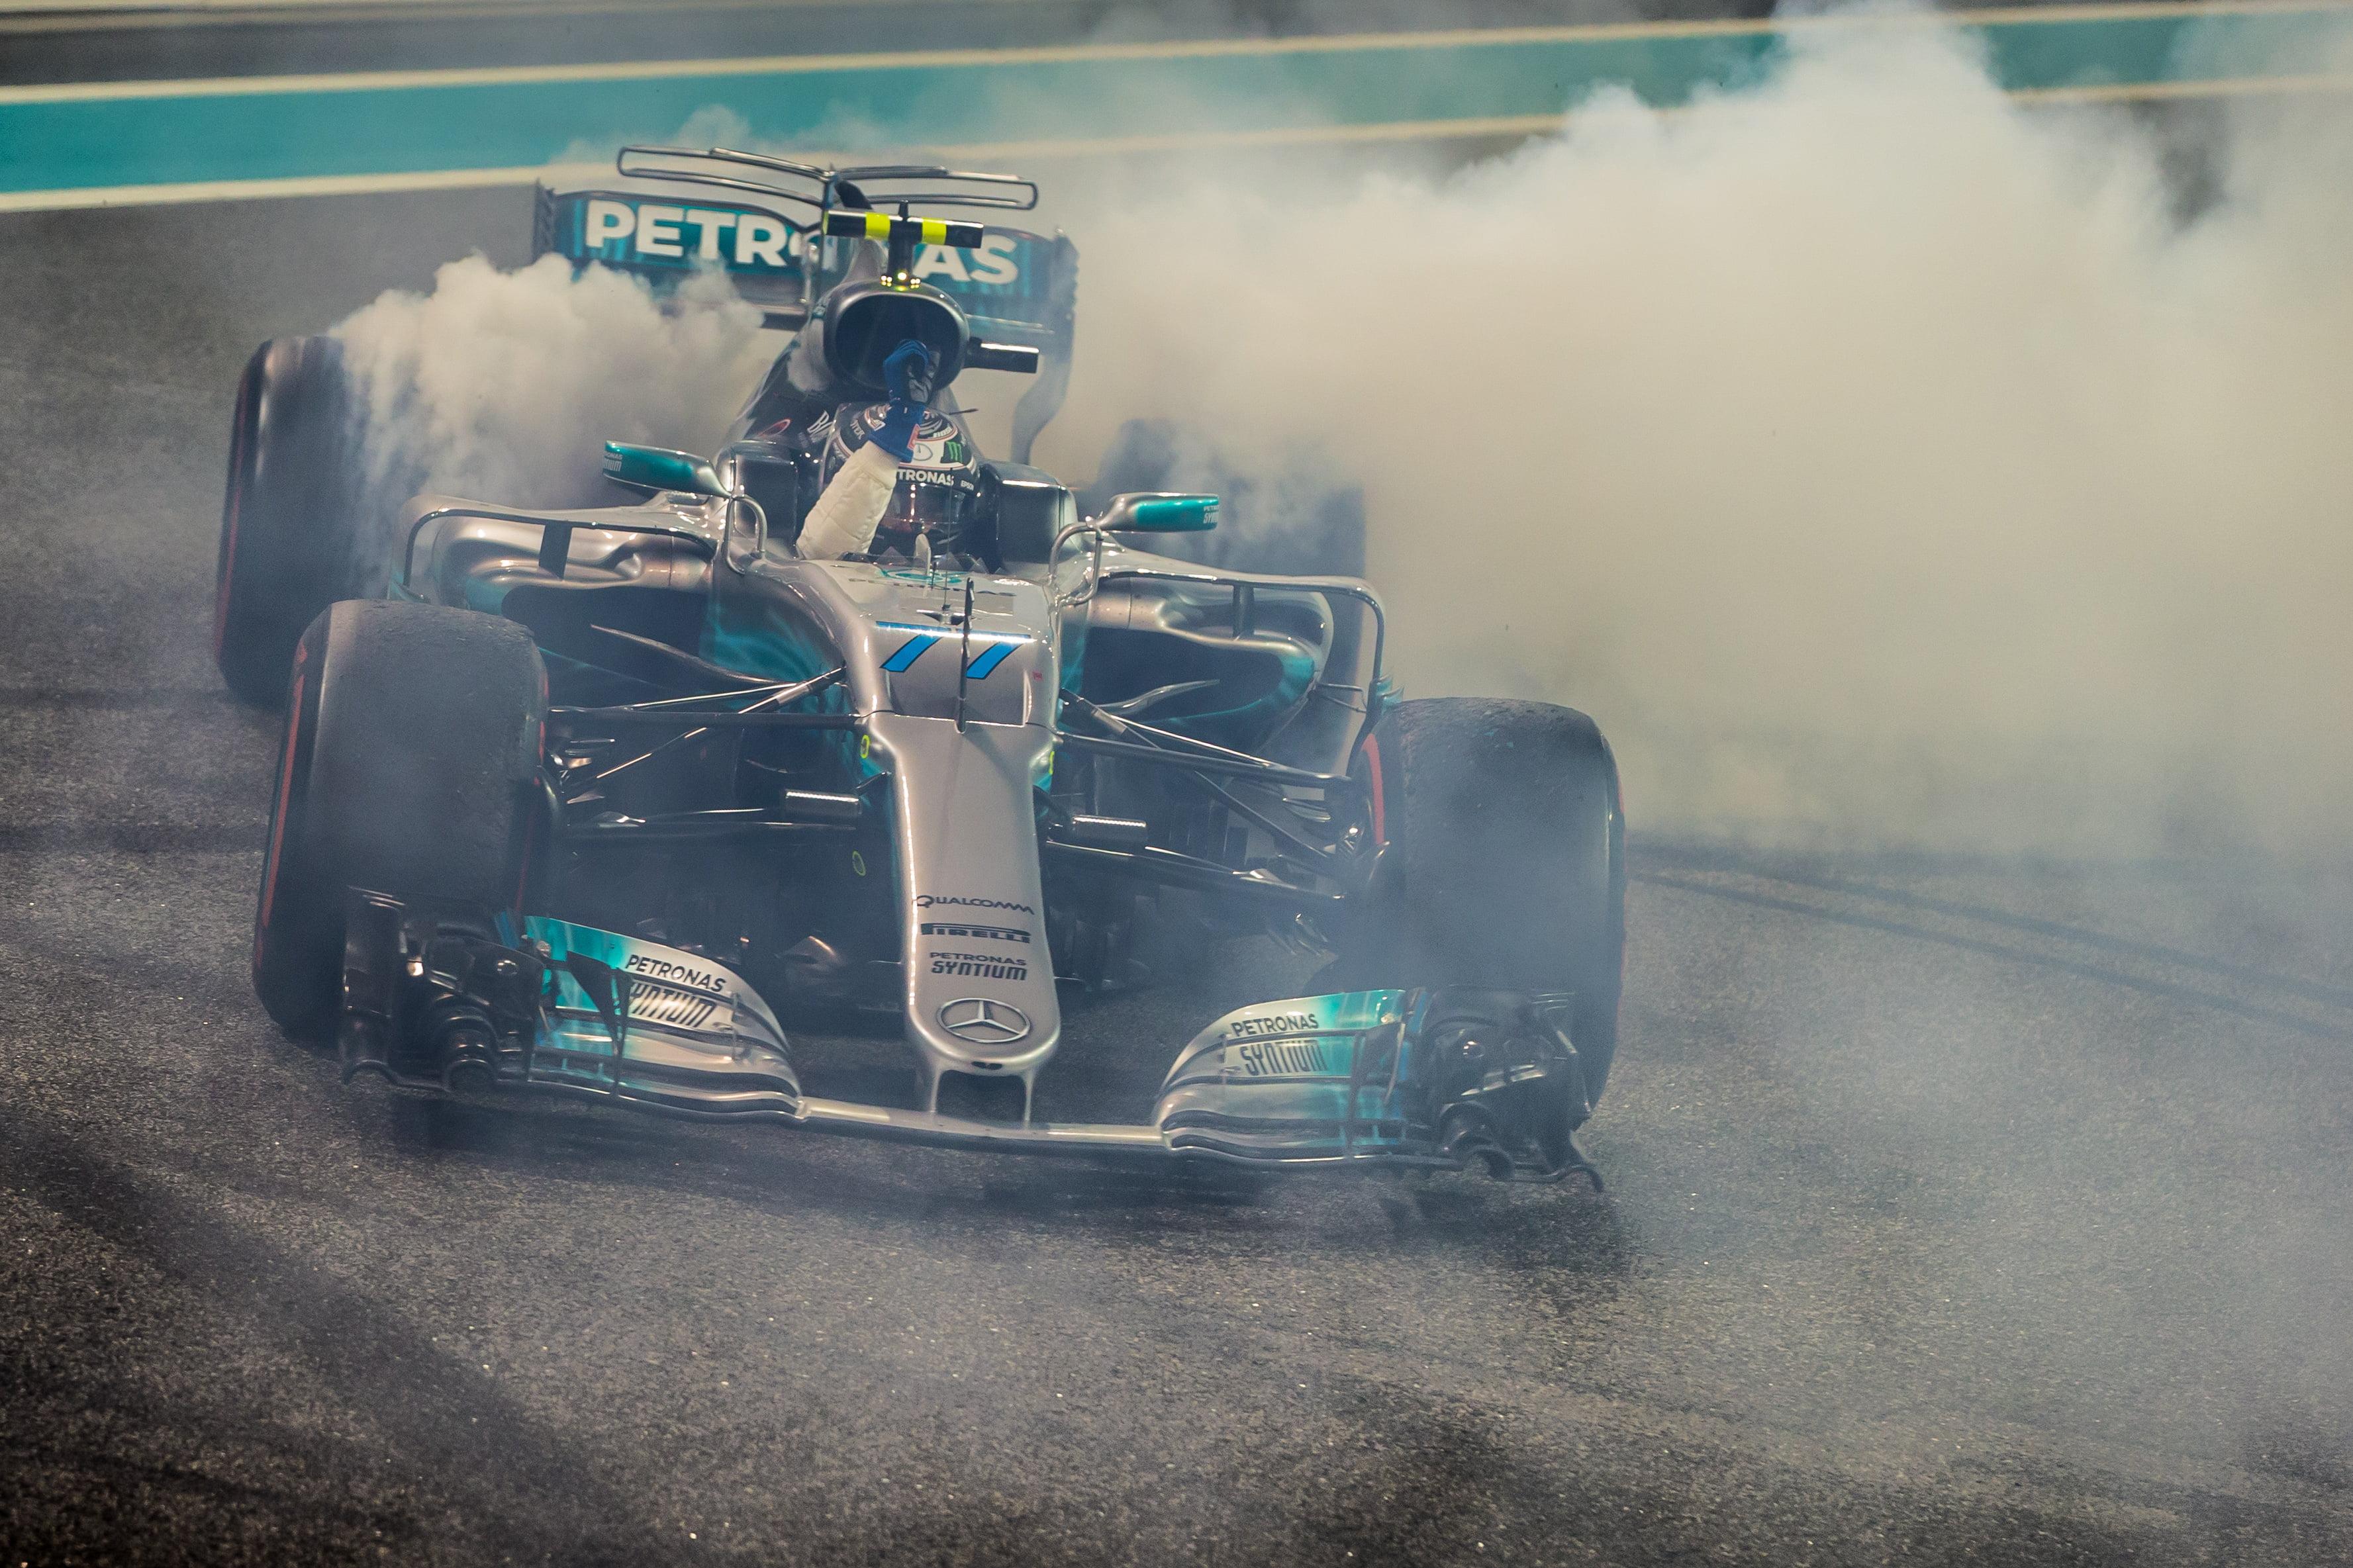 Formula One World Championship 2017, Round 20, Abu Dhabi Grand Prix, Abu Dhabi, United Arab Emirates, Sunday 26 November 2017 – Race winner Valtteri Bottas (FIN) Mercedes AMG F1 W08 celebrates at the end of the race with some doughnuts.